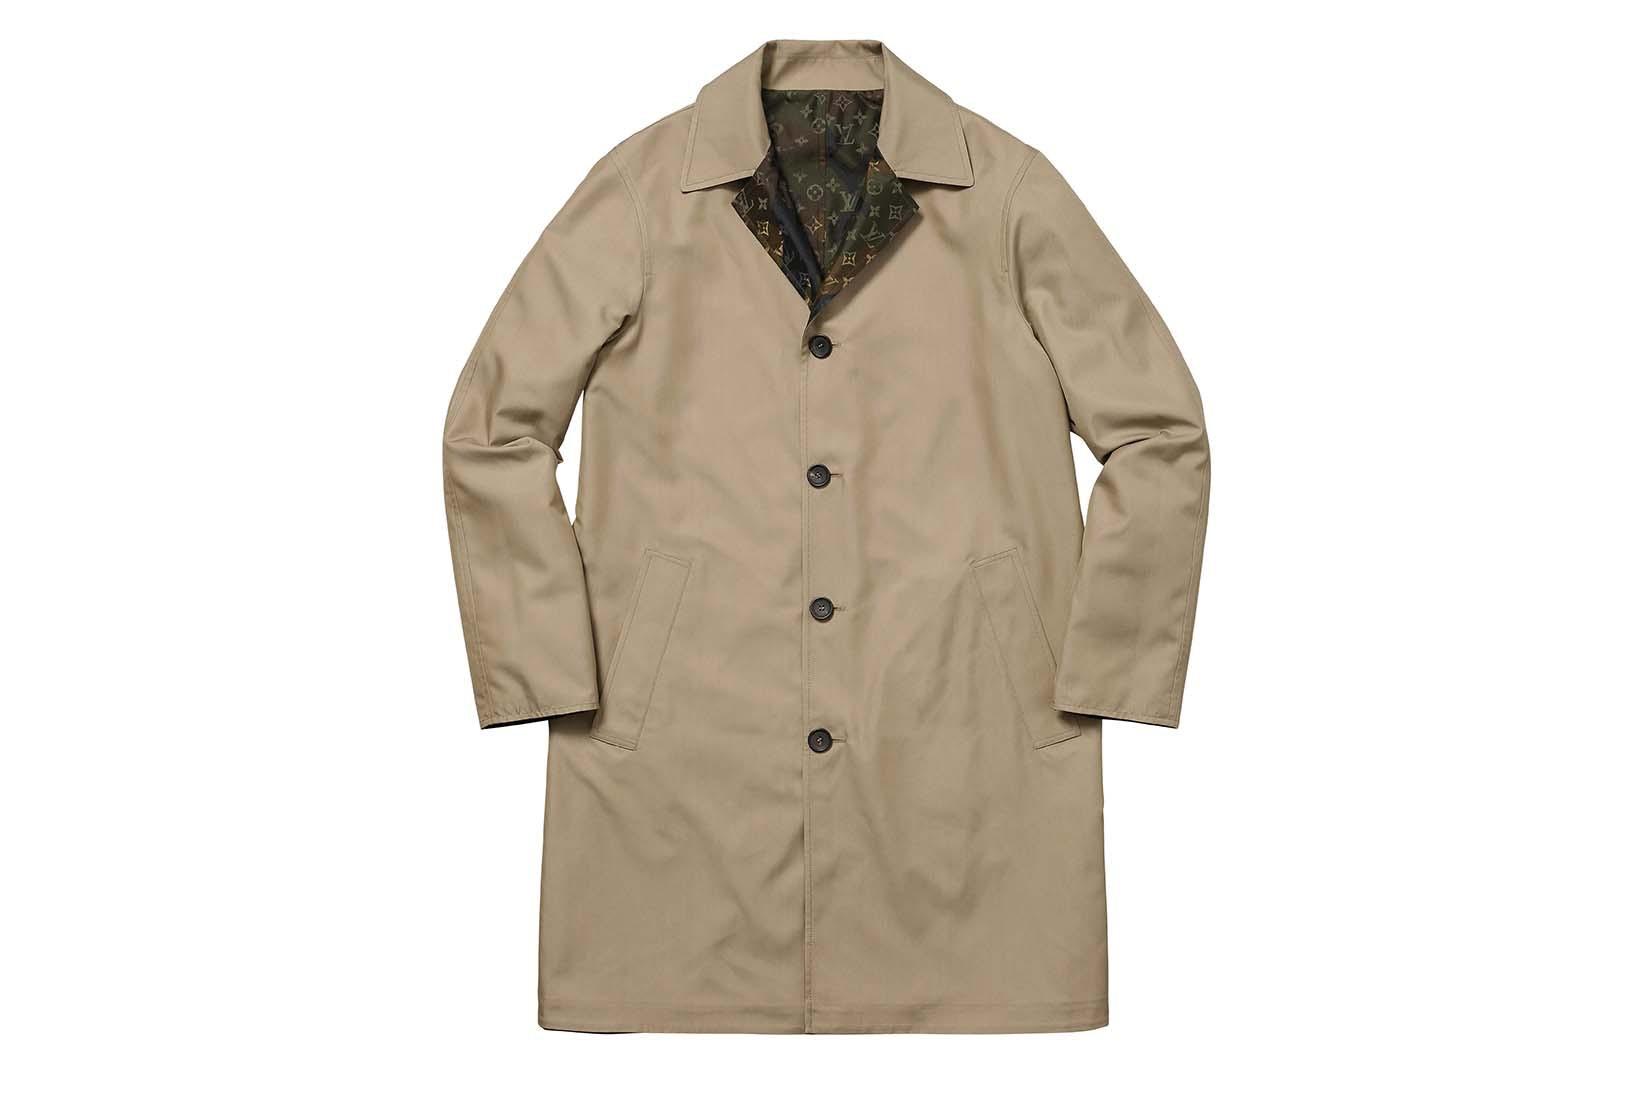 Supreme(シュプリーム)×Louis Vuitton(ルイ・ヴィトン) / リバーシブル トレンチ コート(Reversible Trench Coat)